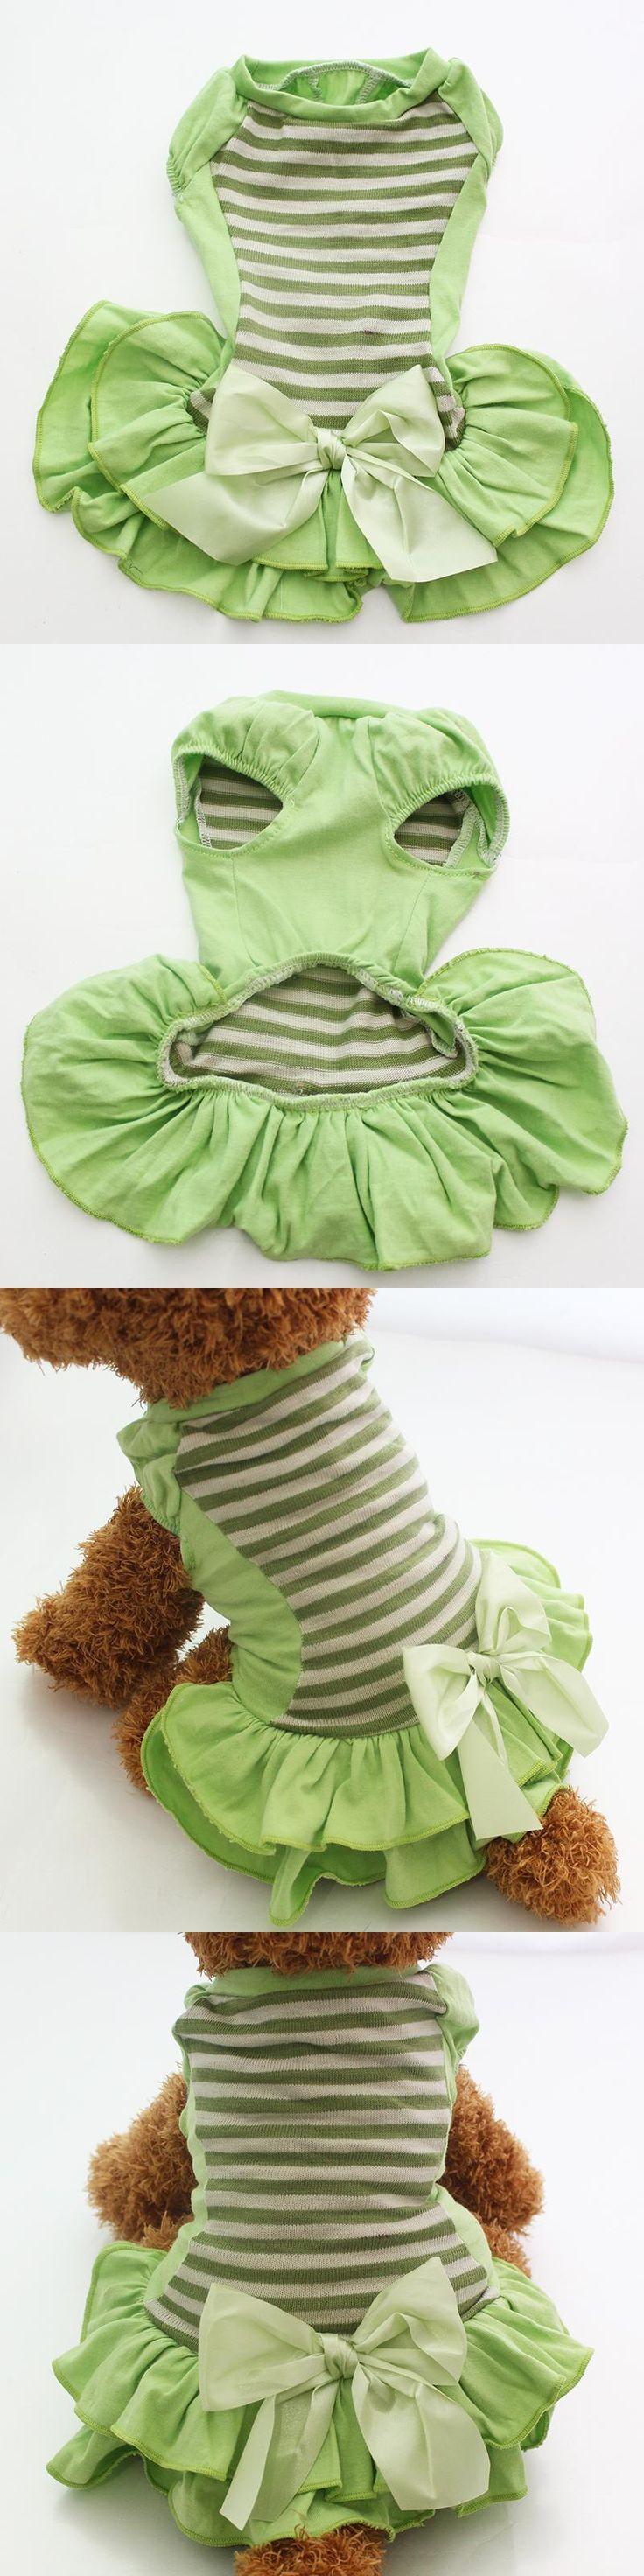 Dog Pet Striped&Bow Dress Home Shirt Cat Puppy Skirt Vest Summer Clothes Apperal